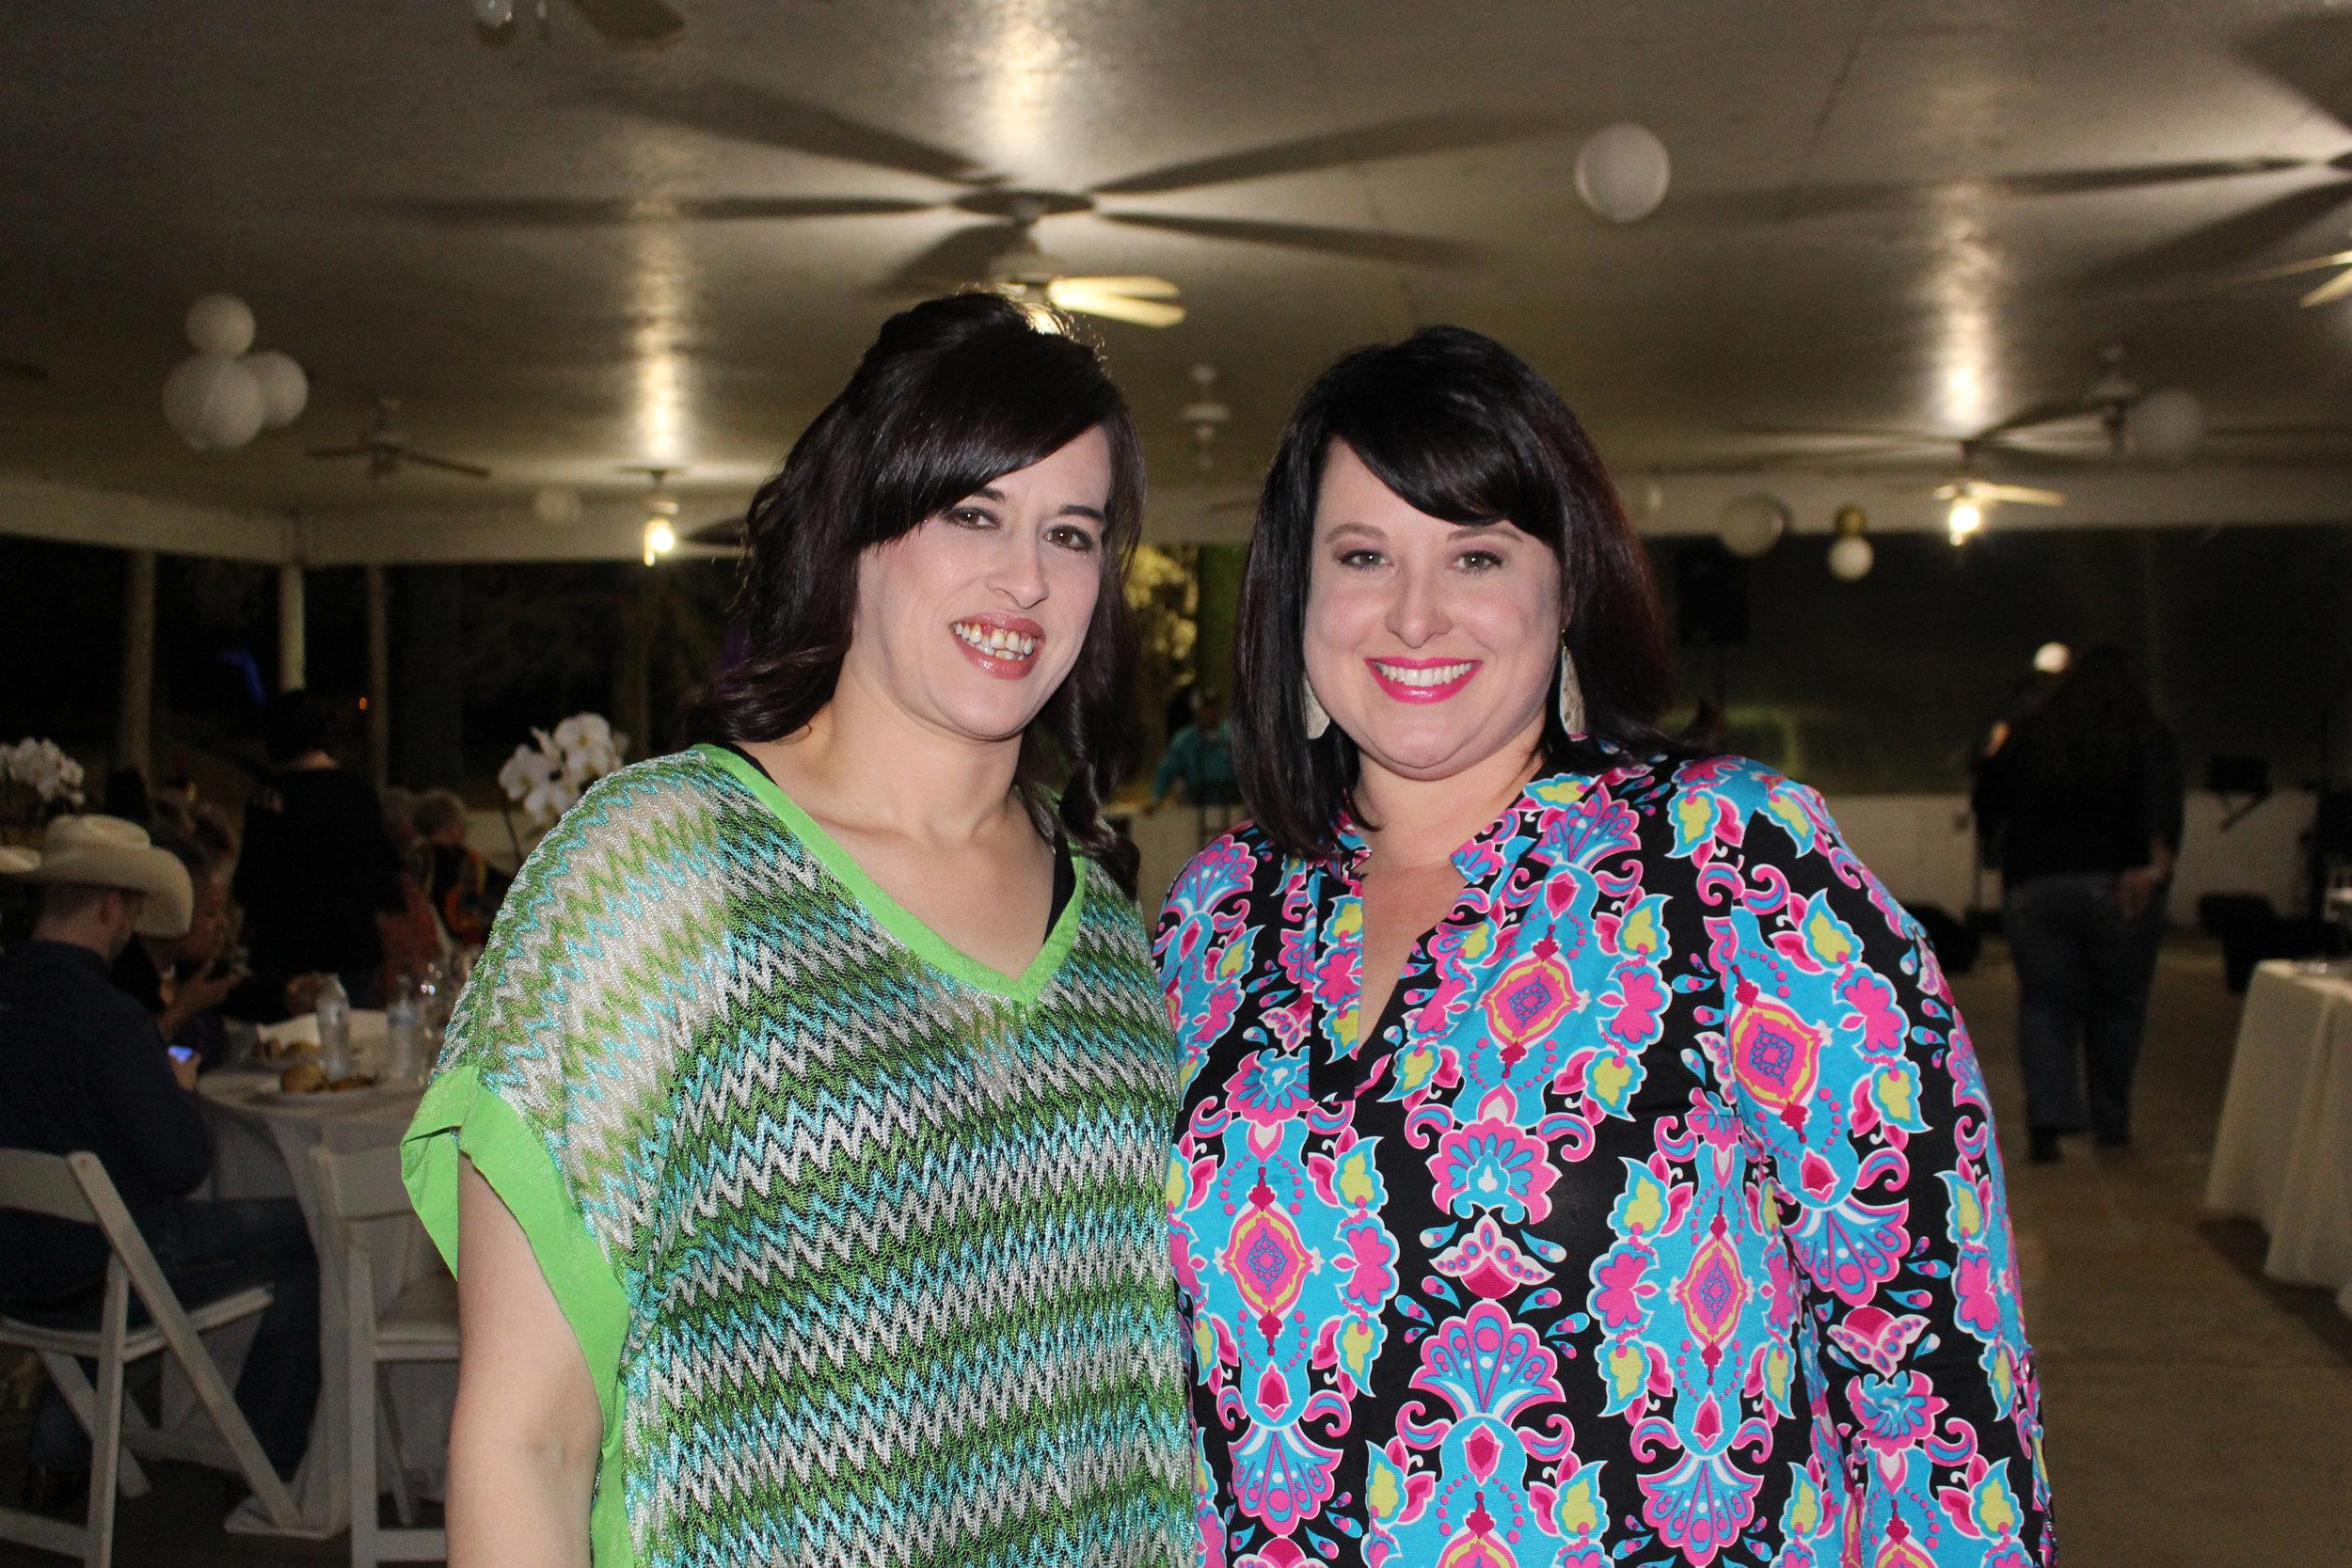 Shelly Sizemore and Karen Dillinger